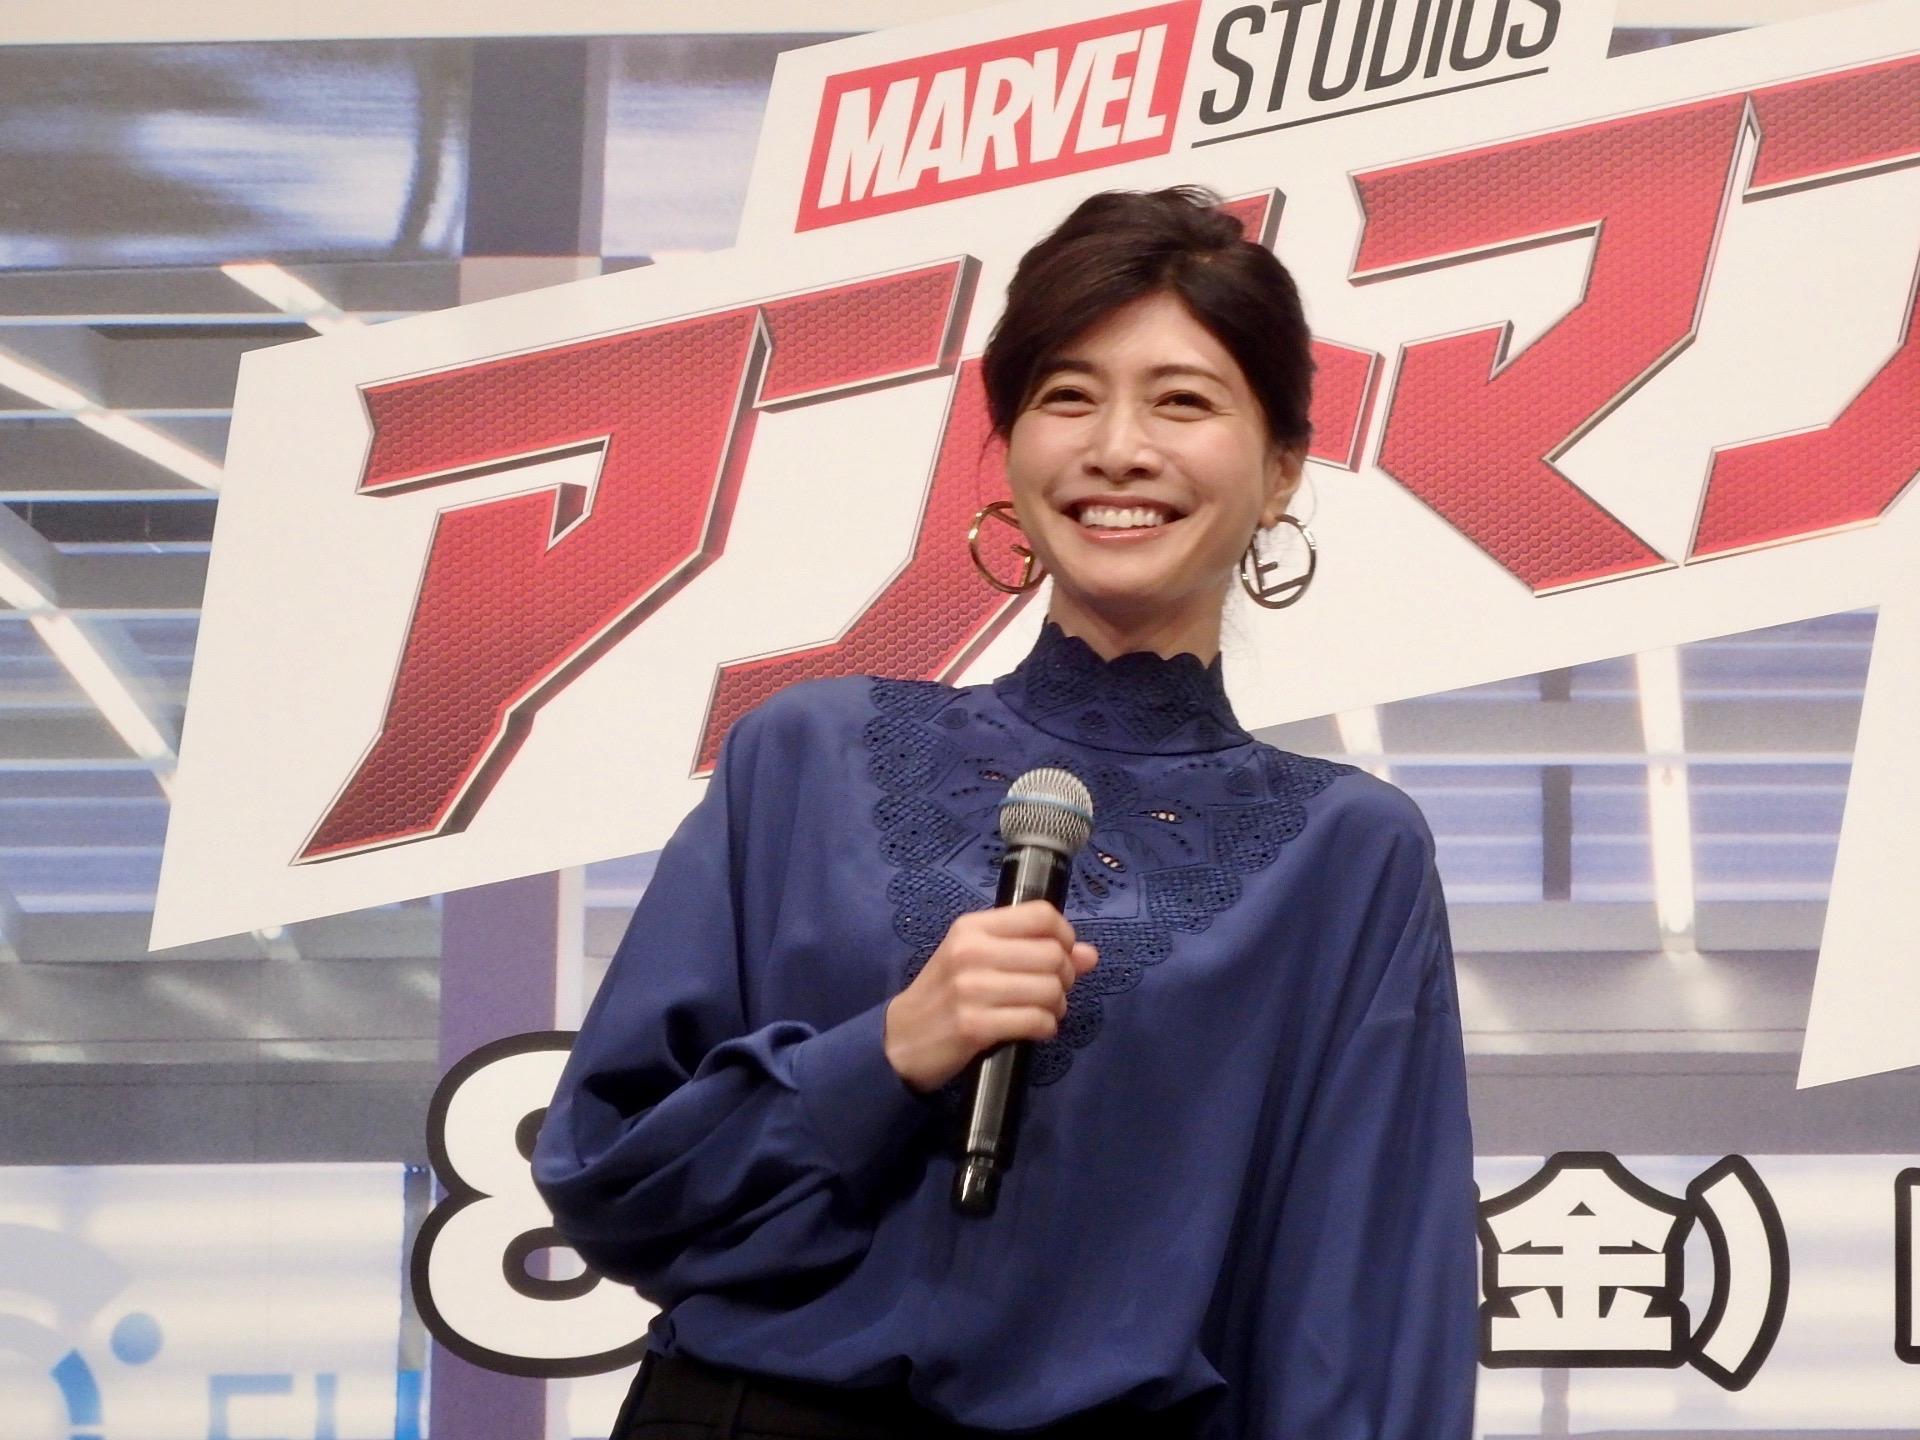 http://news.yoshimoto.co.jp/20180708154454-588975365f760f328db91e90cc341aea25d6be44.jpg